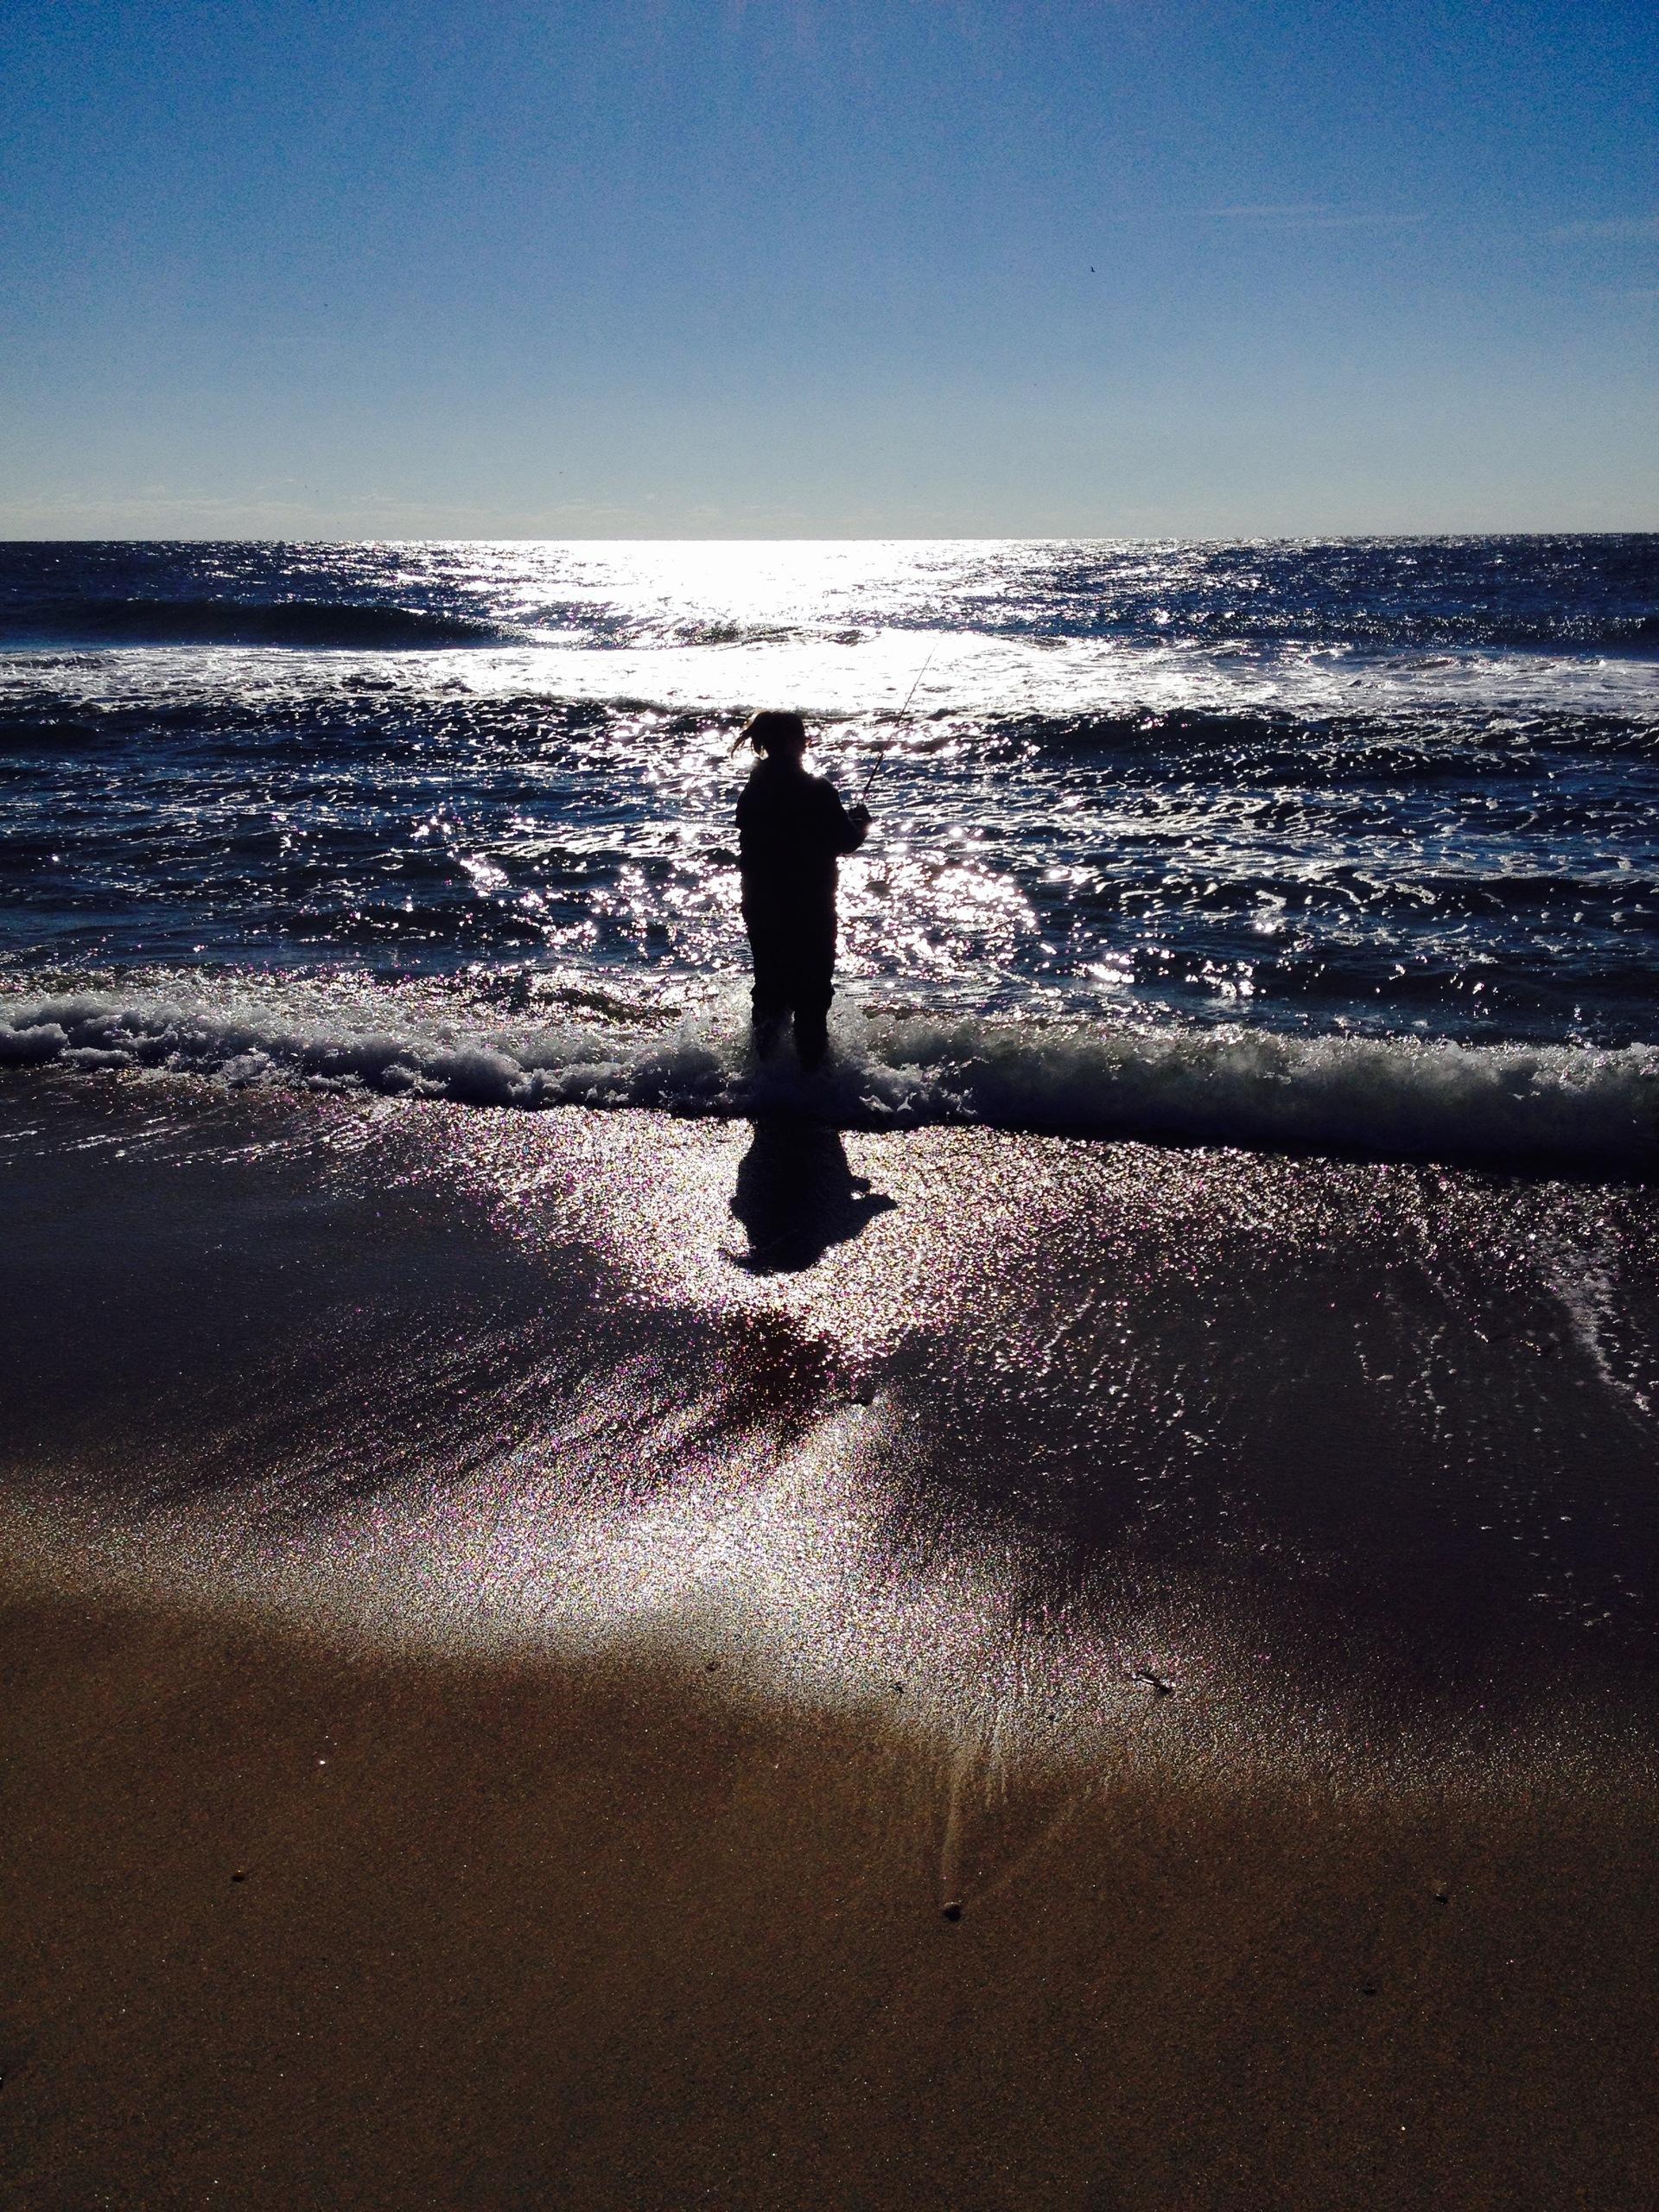 Lonely montauk fisherman solo man fishing at for Montauk ny fishing